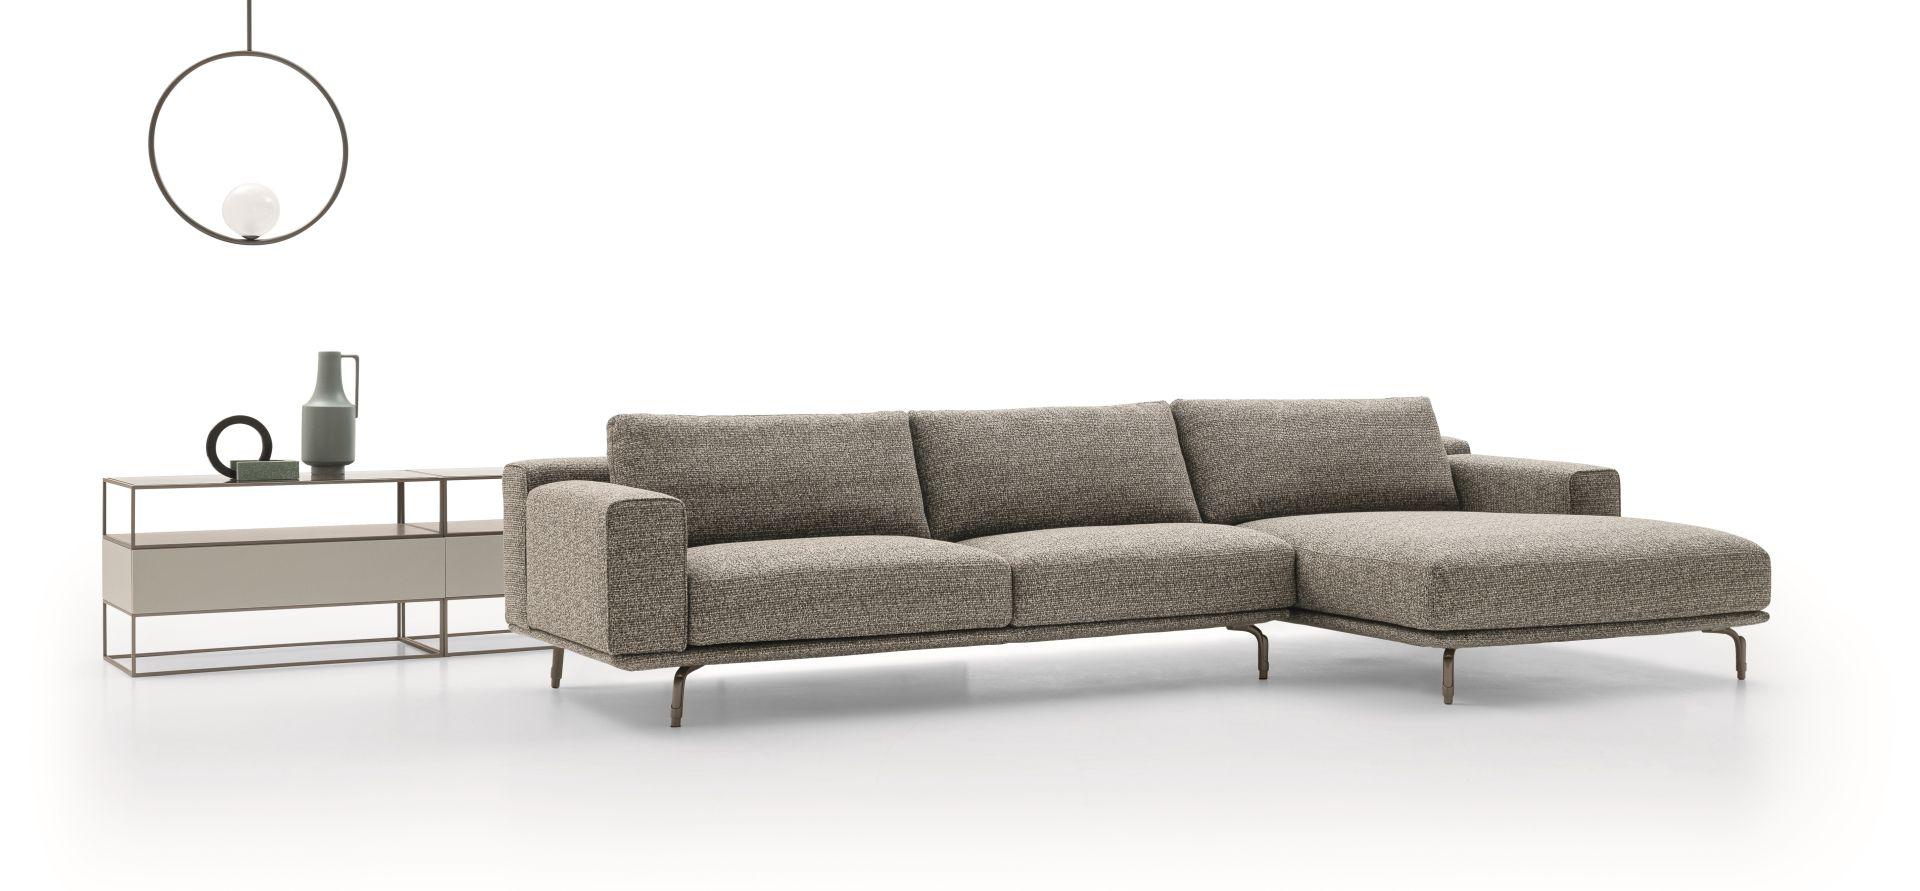 Ditre Italia Dalton Low Sofa